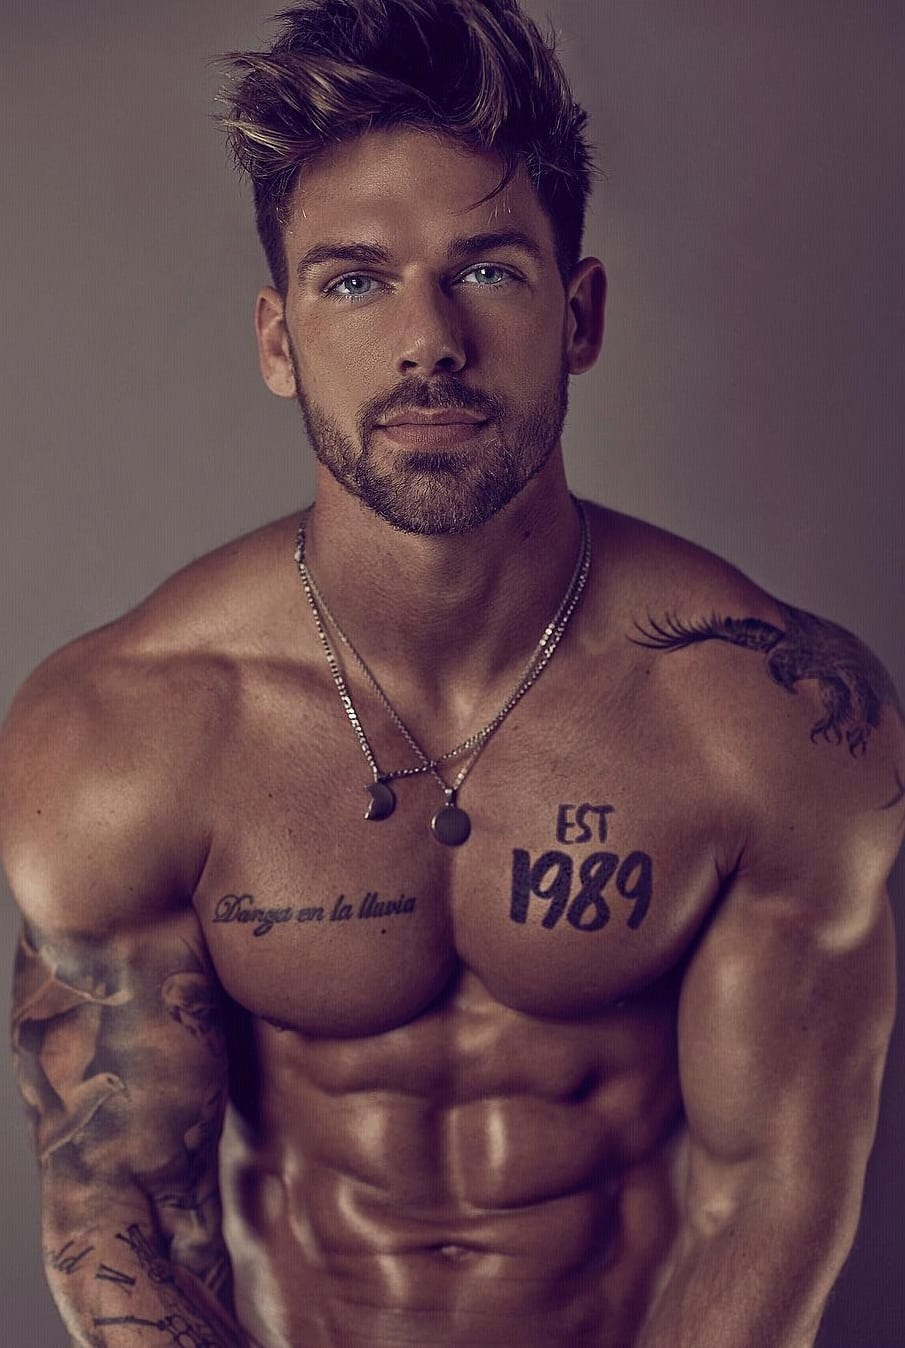 Trendy Tattoo Designs For Men